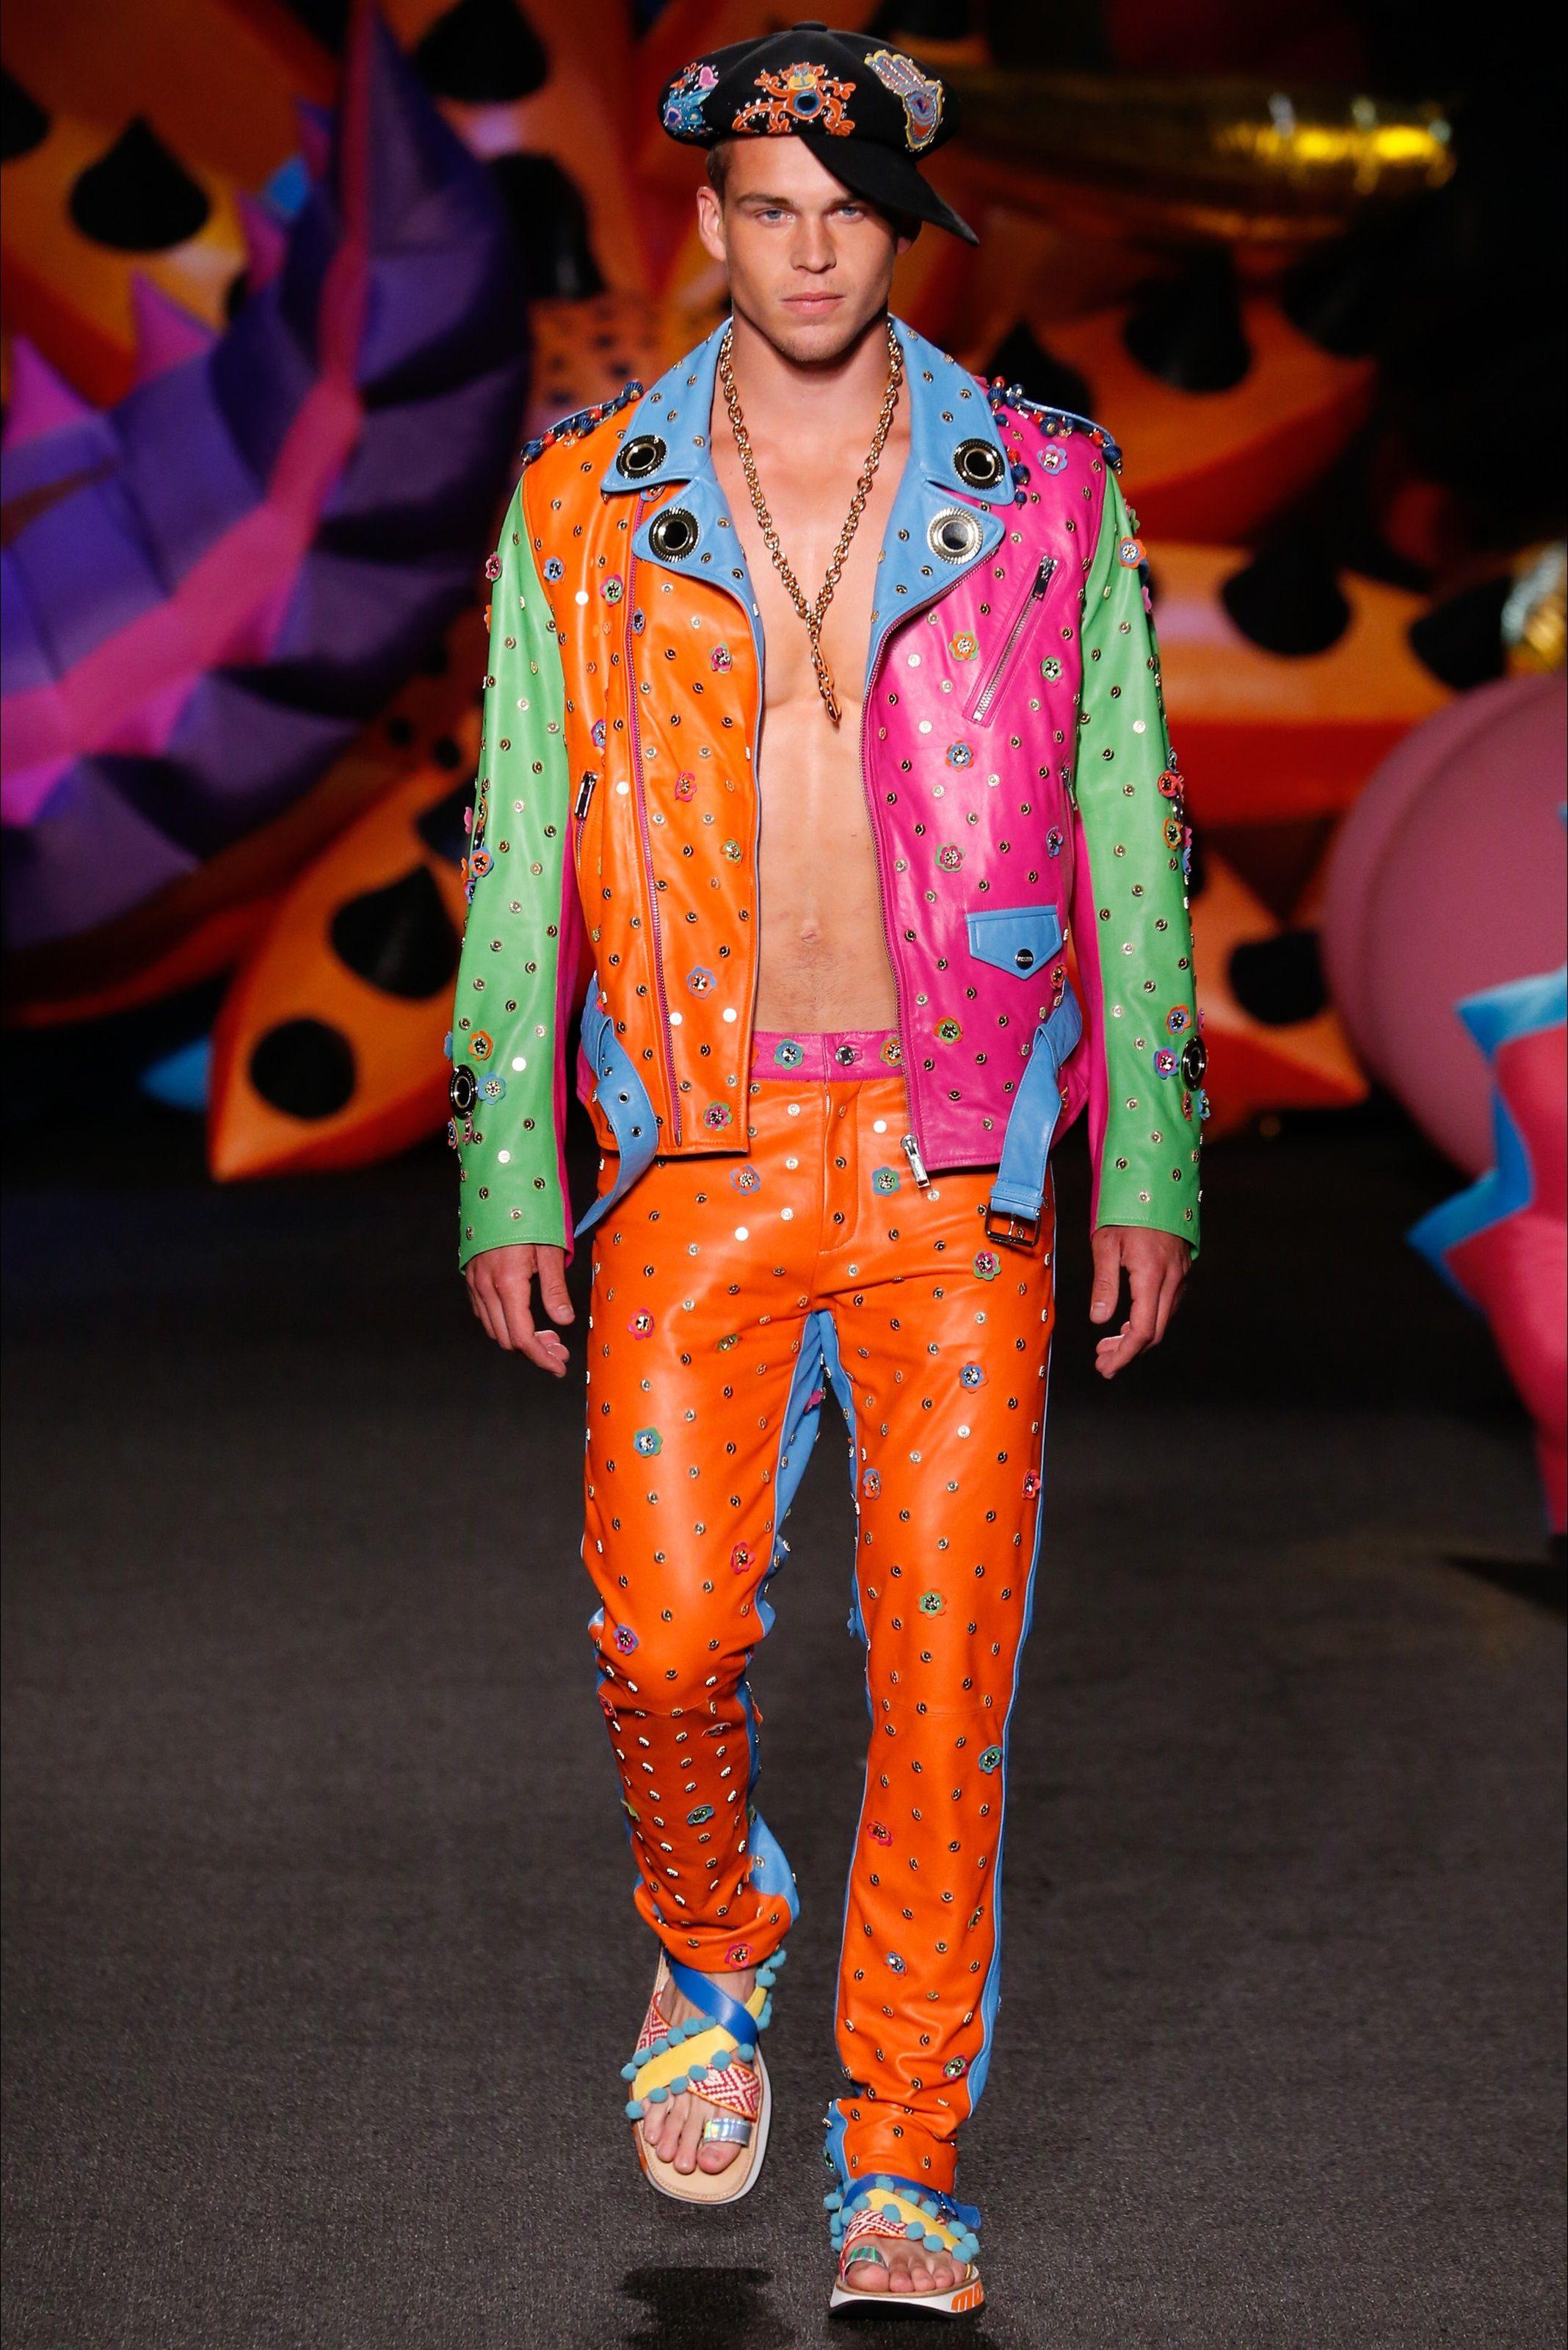 Sfilata Moda Uomo Moschino Los Angeles - Primavera Estate 2017 - Vogue f94176564cc